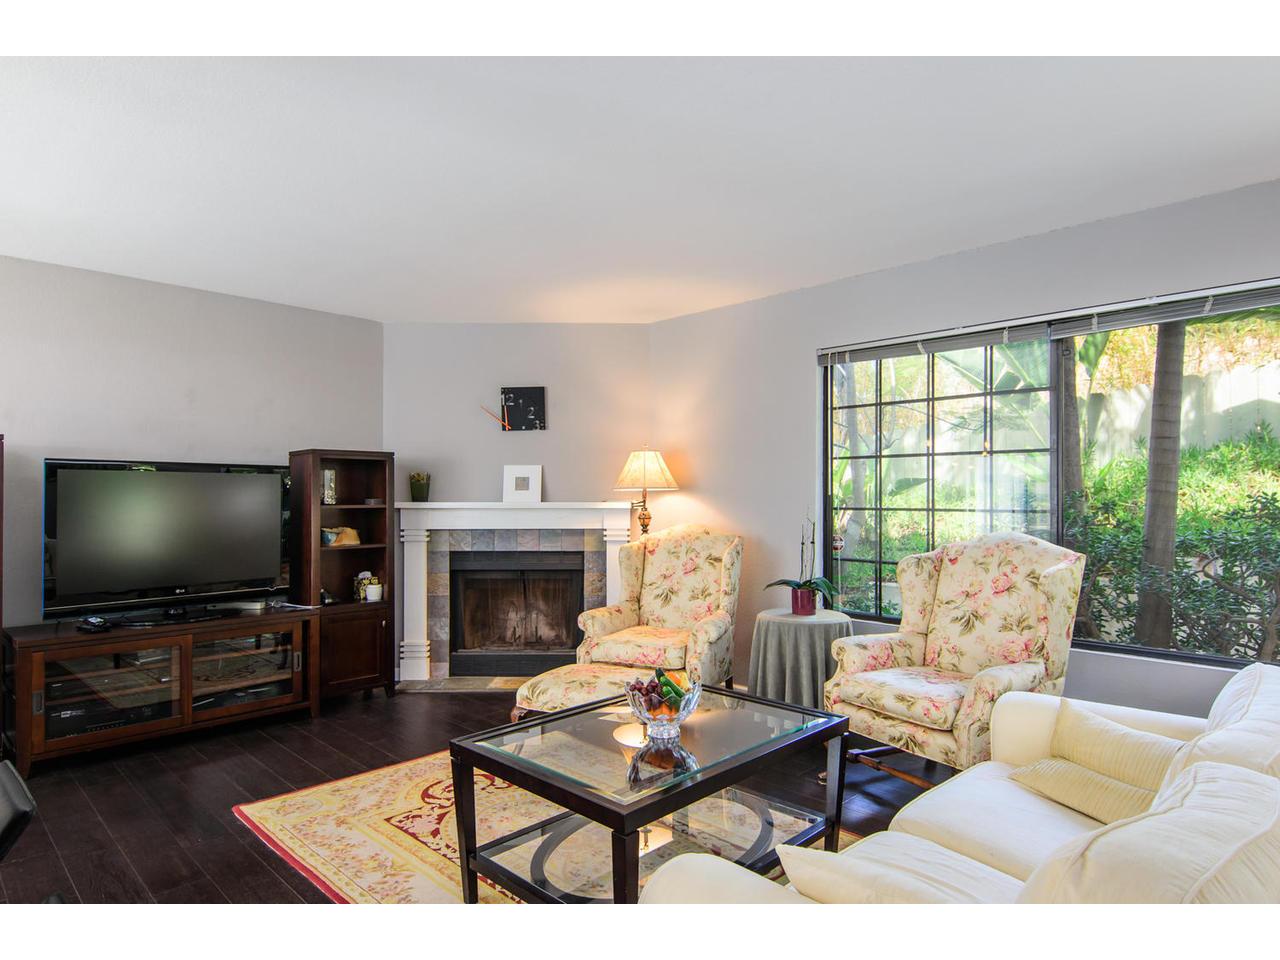 3579 Curlew Street San Diego-MLS_Size-007-3579 Curlew Street San Diego-1280x960-72dpi.jpg